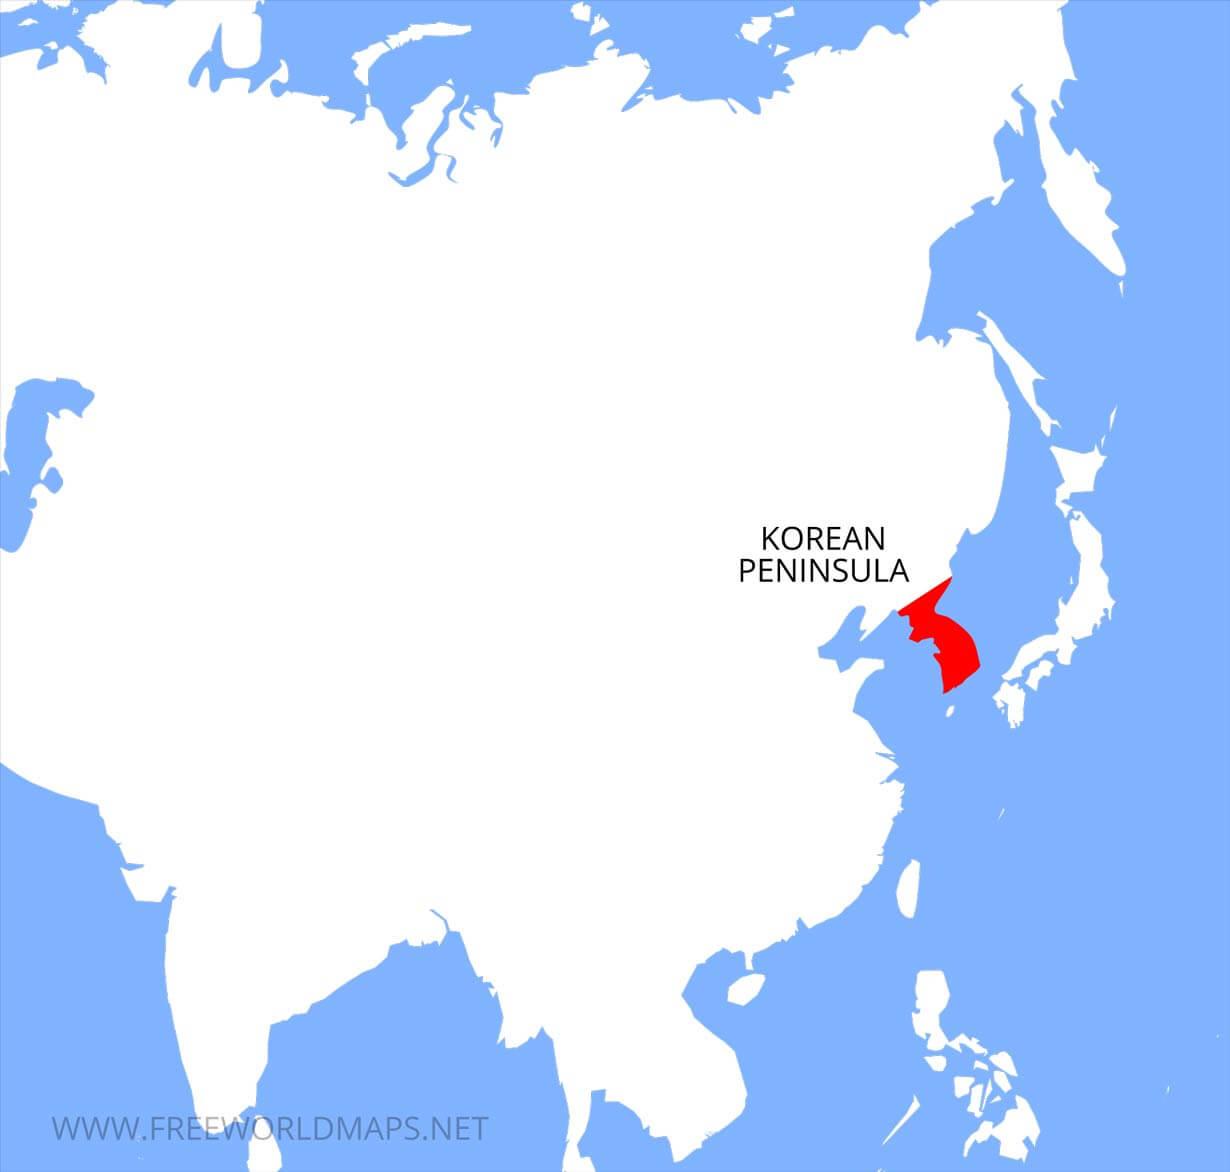 Korean Peninsula maps